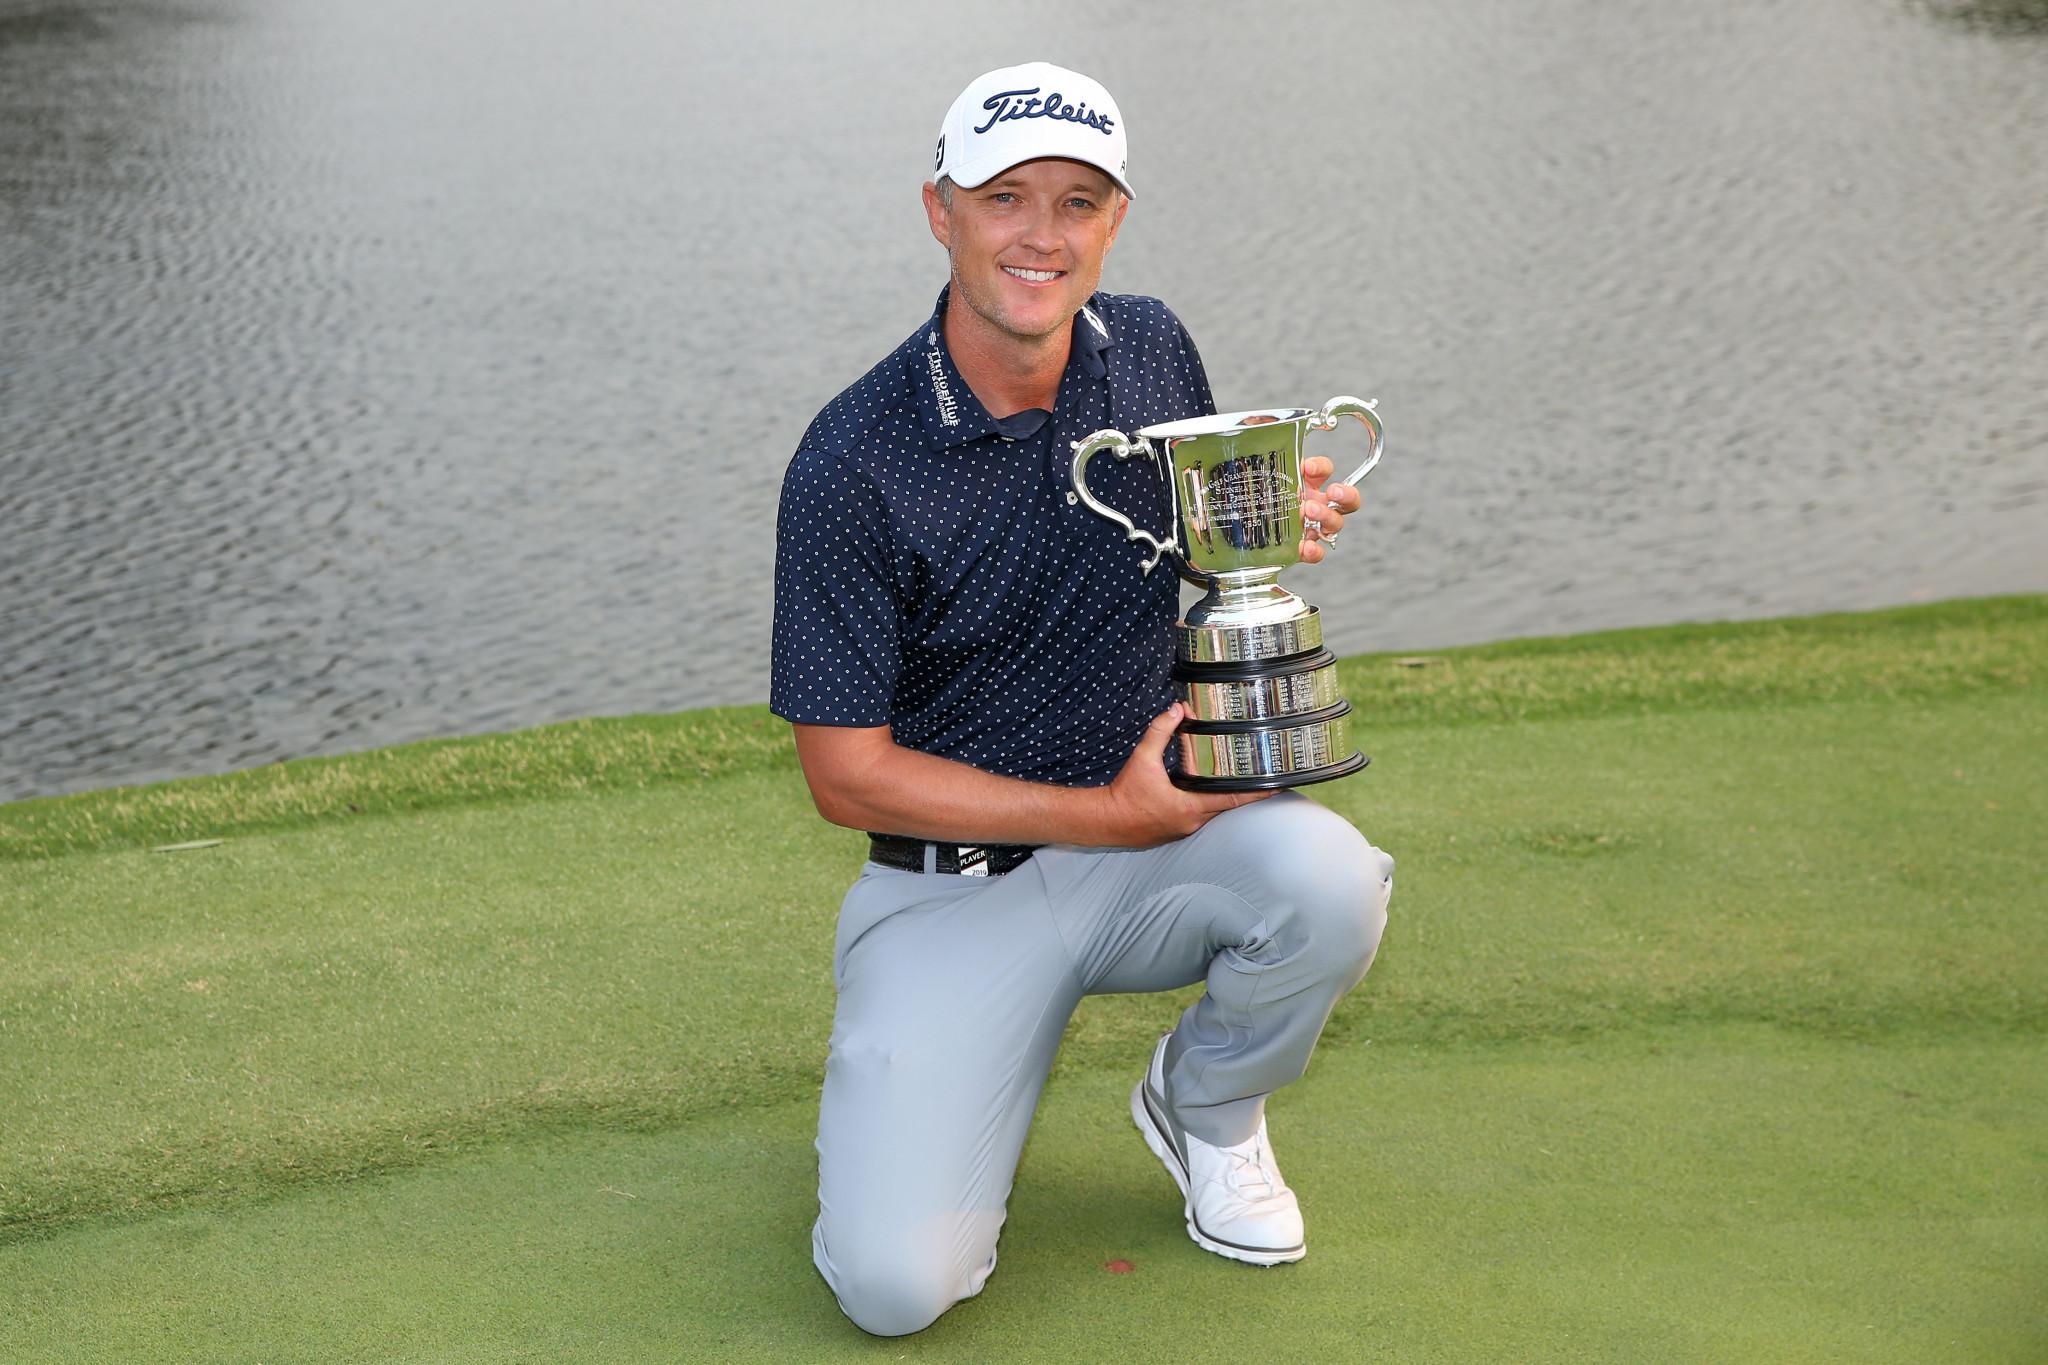 Organisers cancel men's and women's Australian Open golf tournaments over travel restrictions